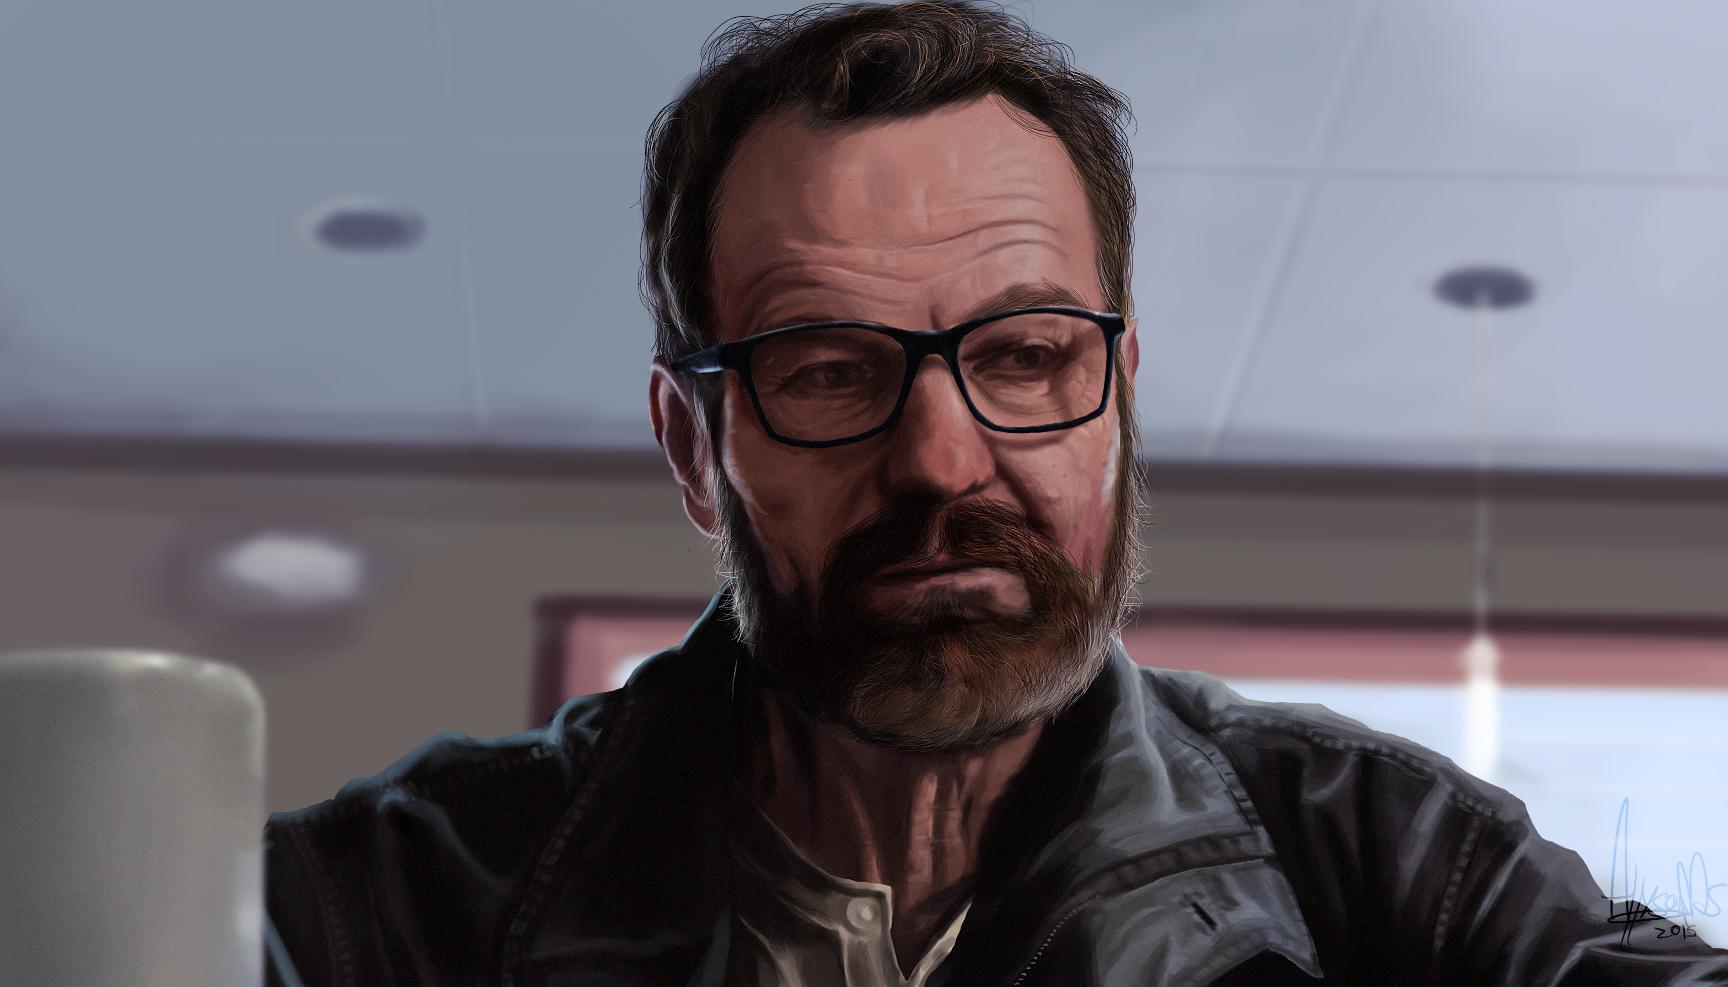 Heisenberg (Breaking Bad) by HeartOfTheSunrise on DeviantArt